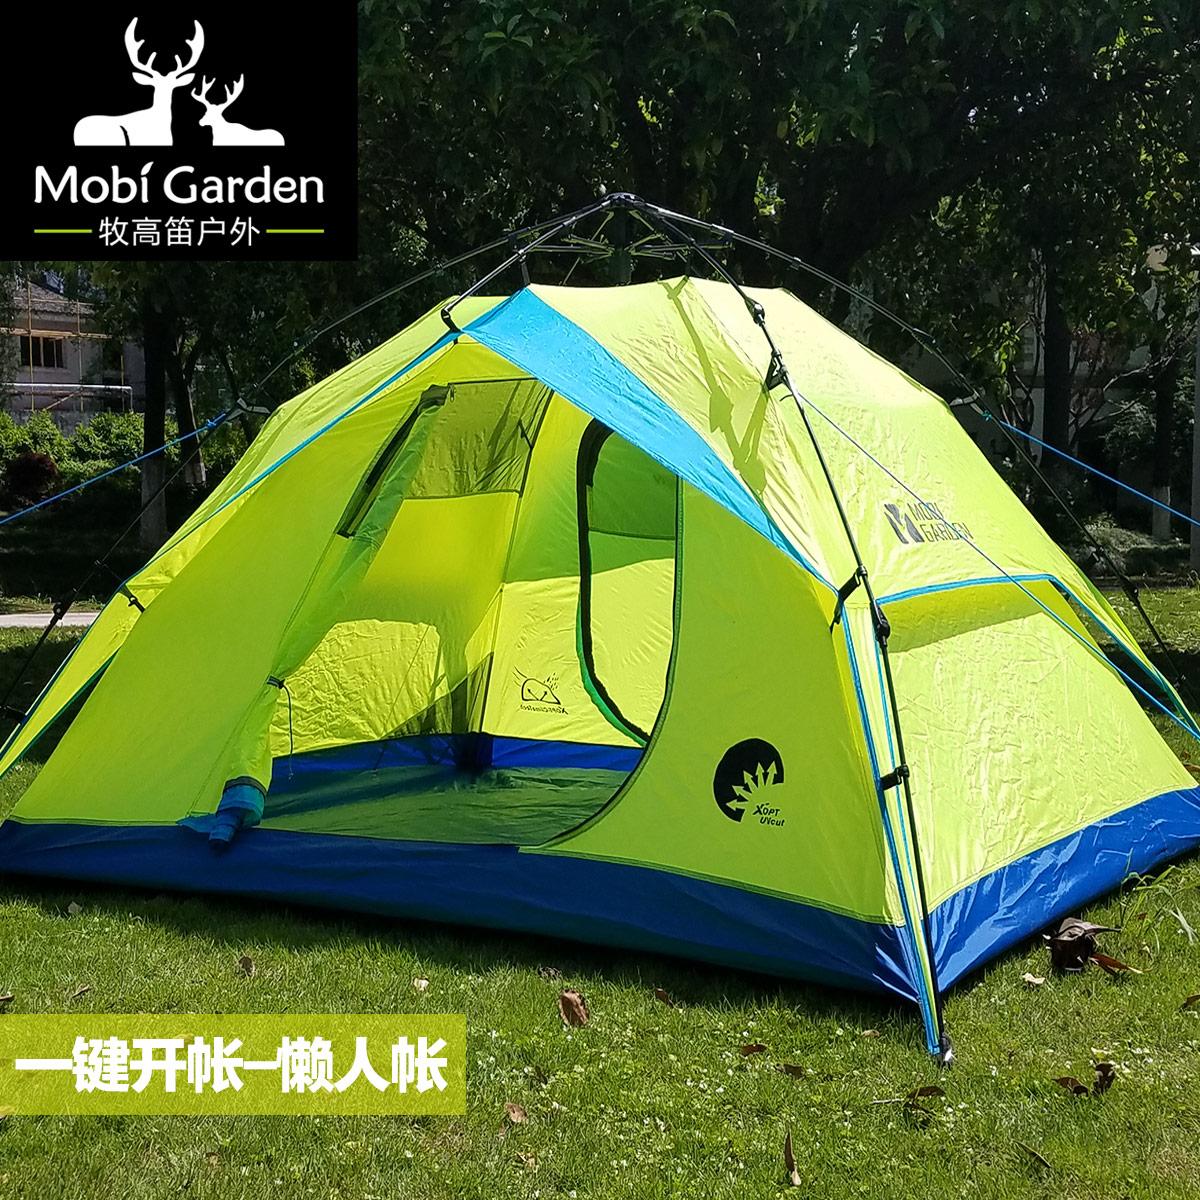 auto camping zelte kaufen billigauto camping zelte partien. Black Bedroom Furniture Sets. Home Design Ideas